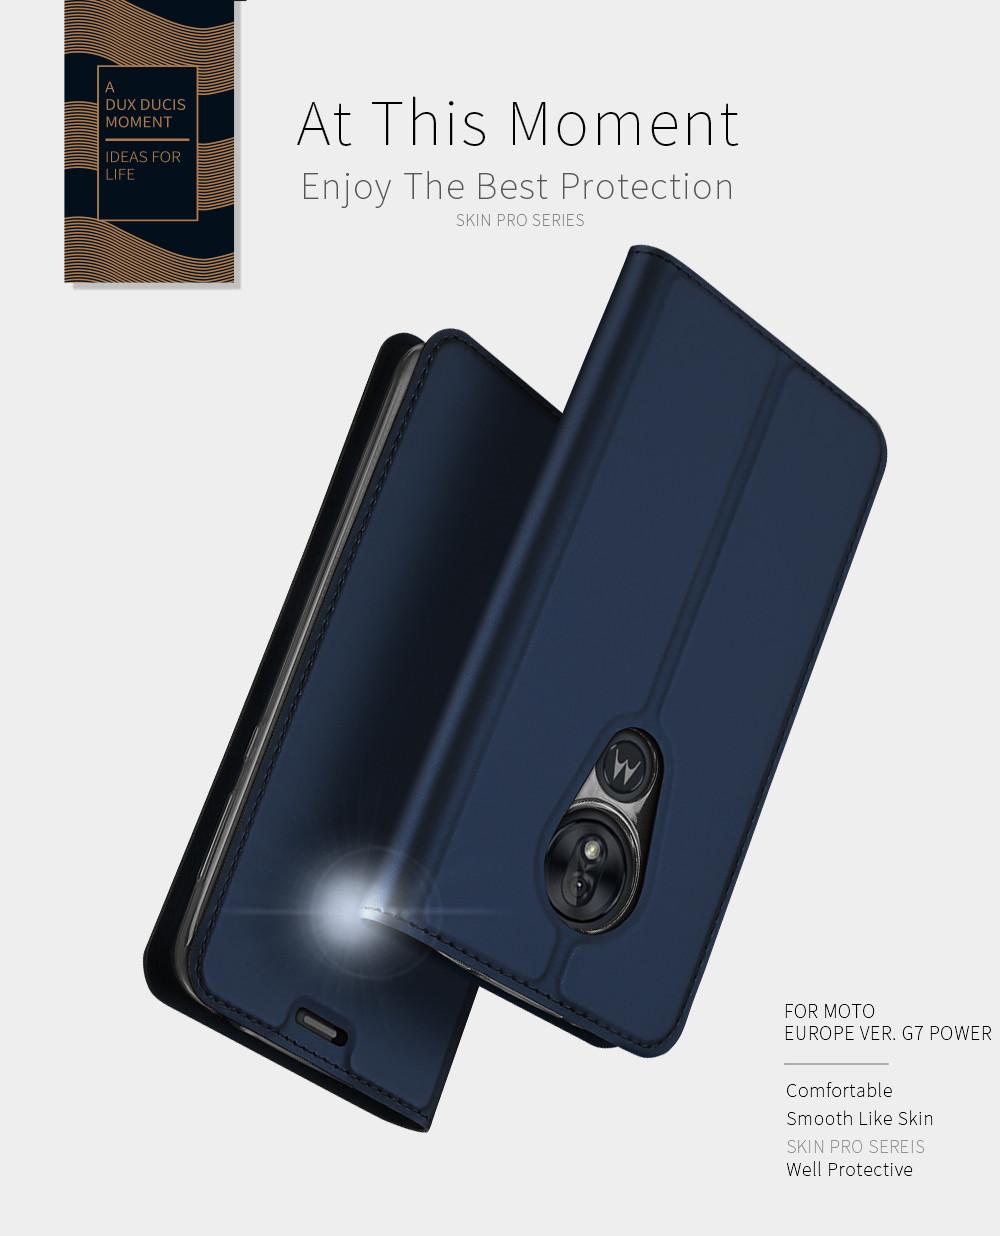 Skin Pro Series Case For Moto G7 Power For Europe Phone